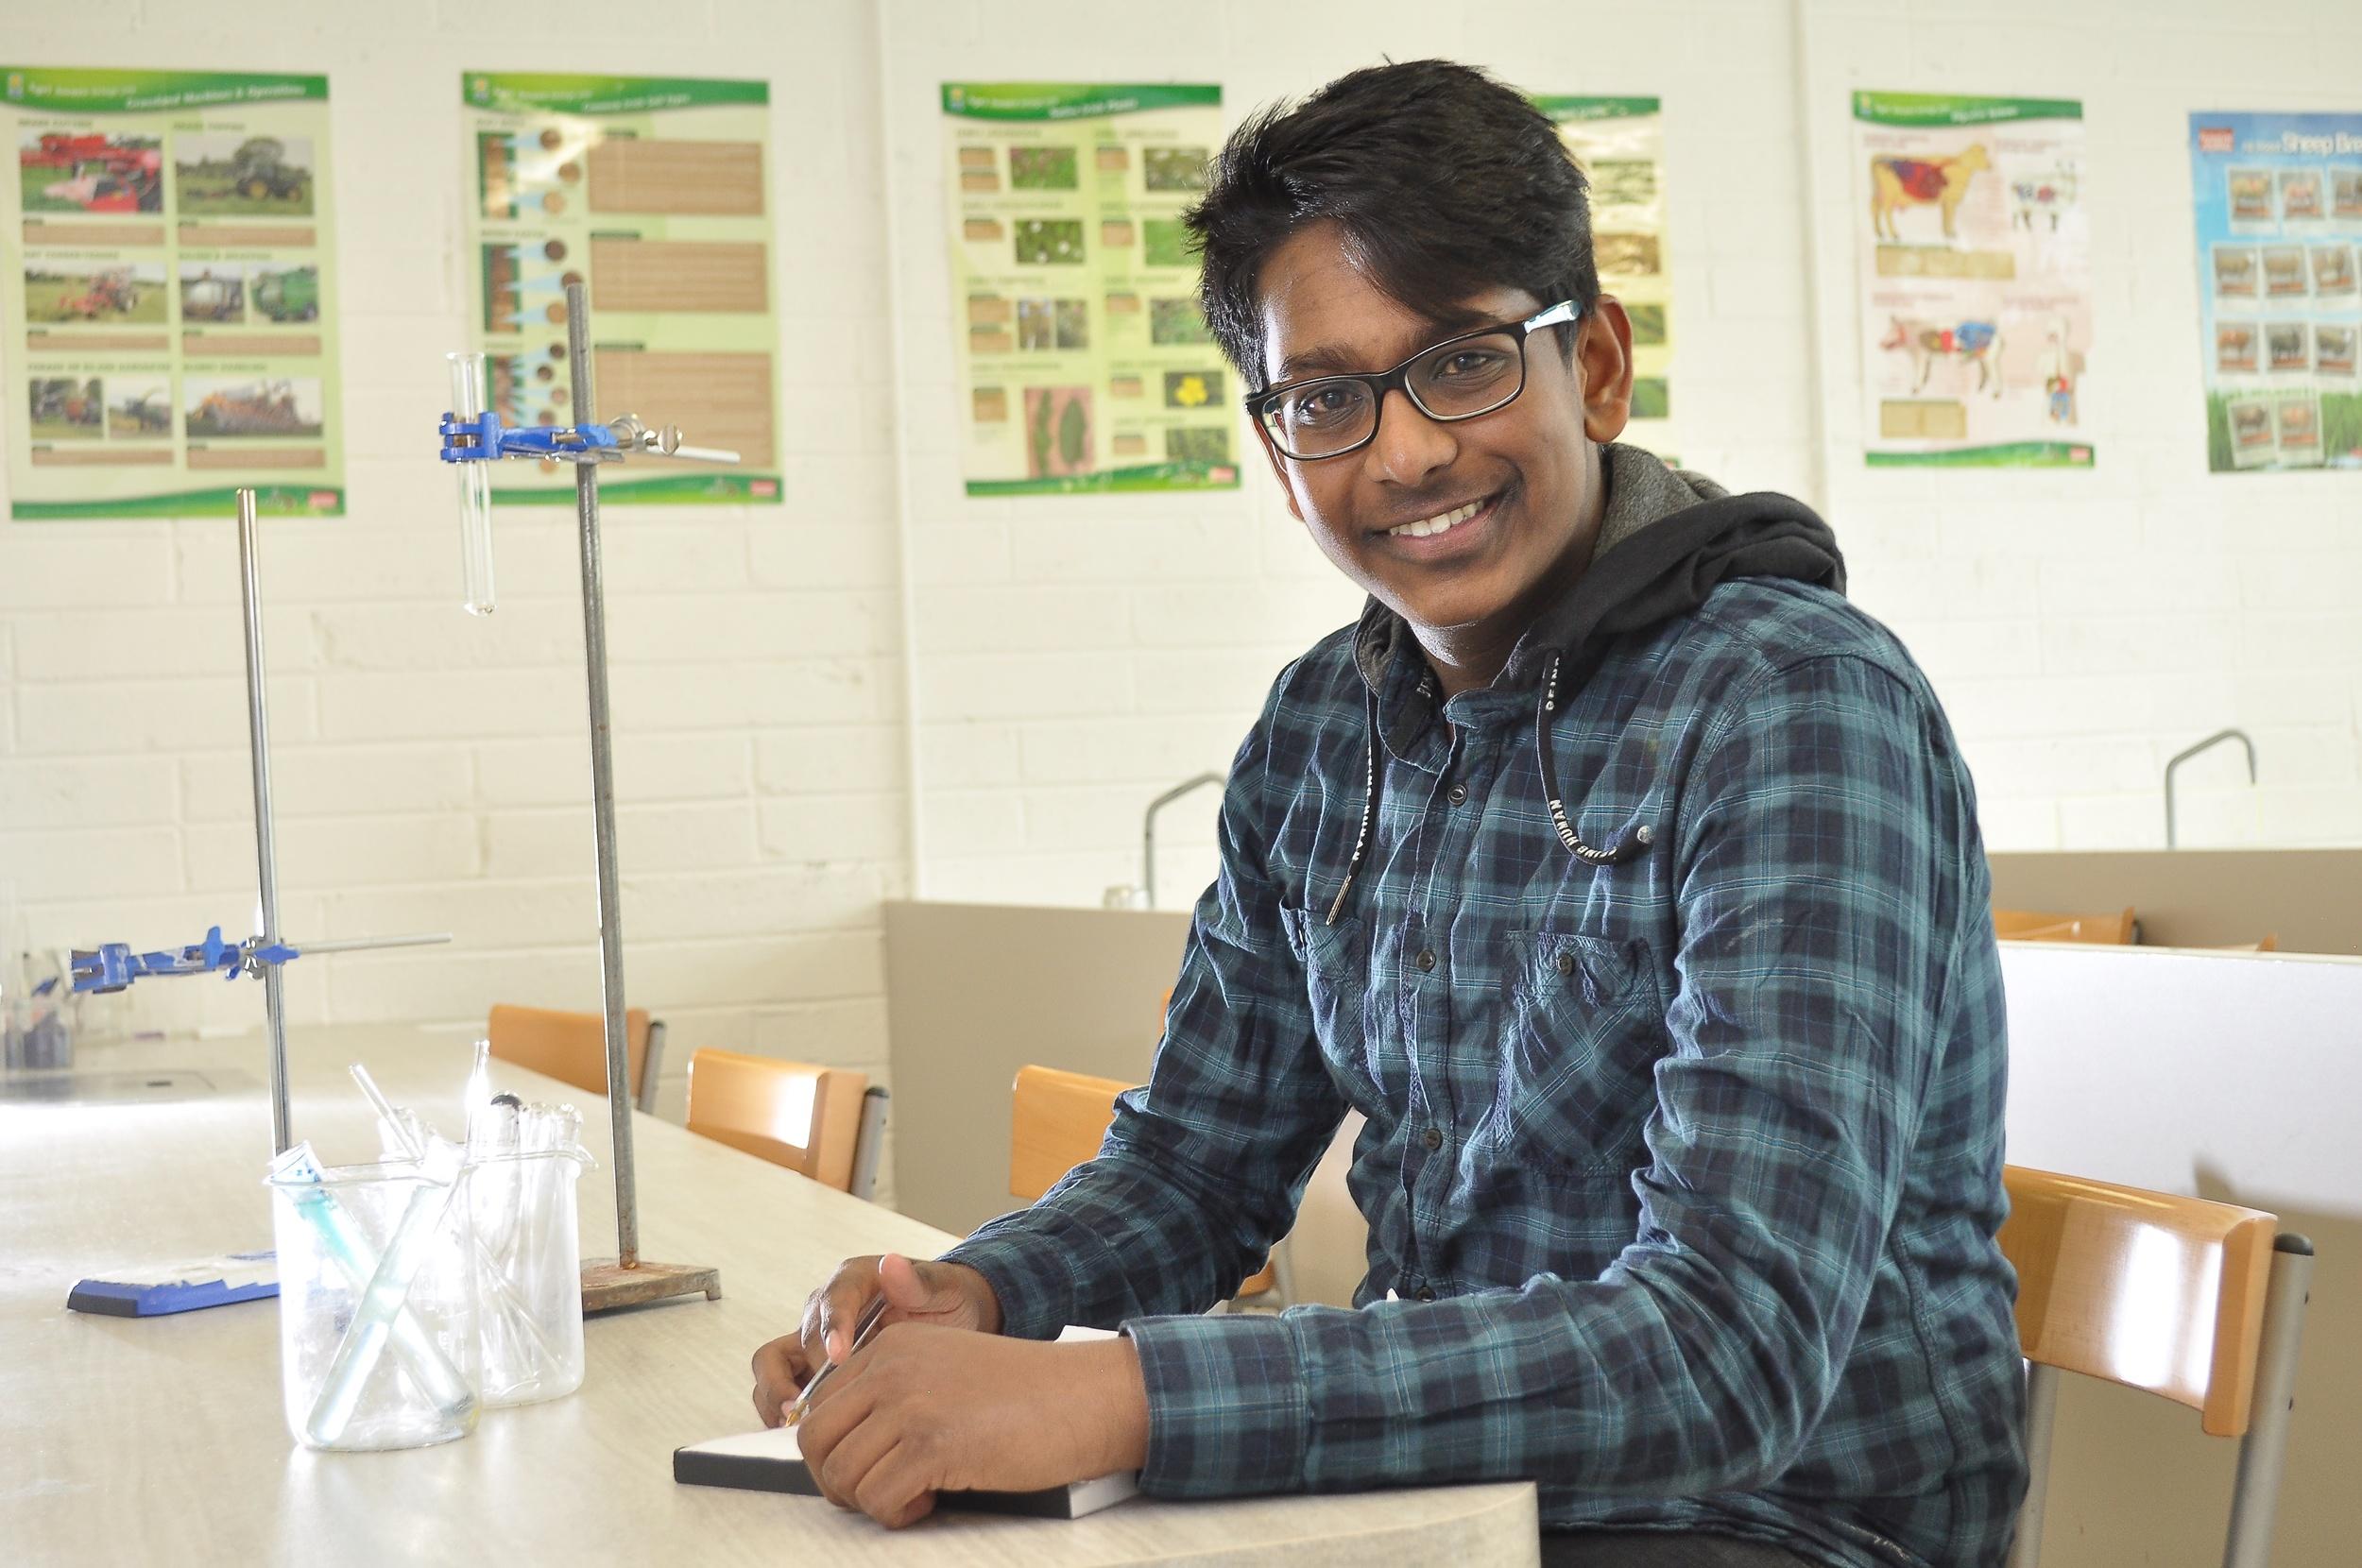 Ashfield College Prospectus Shoot